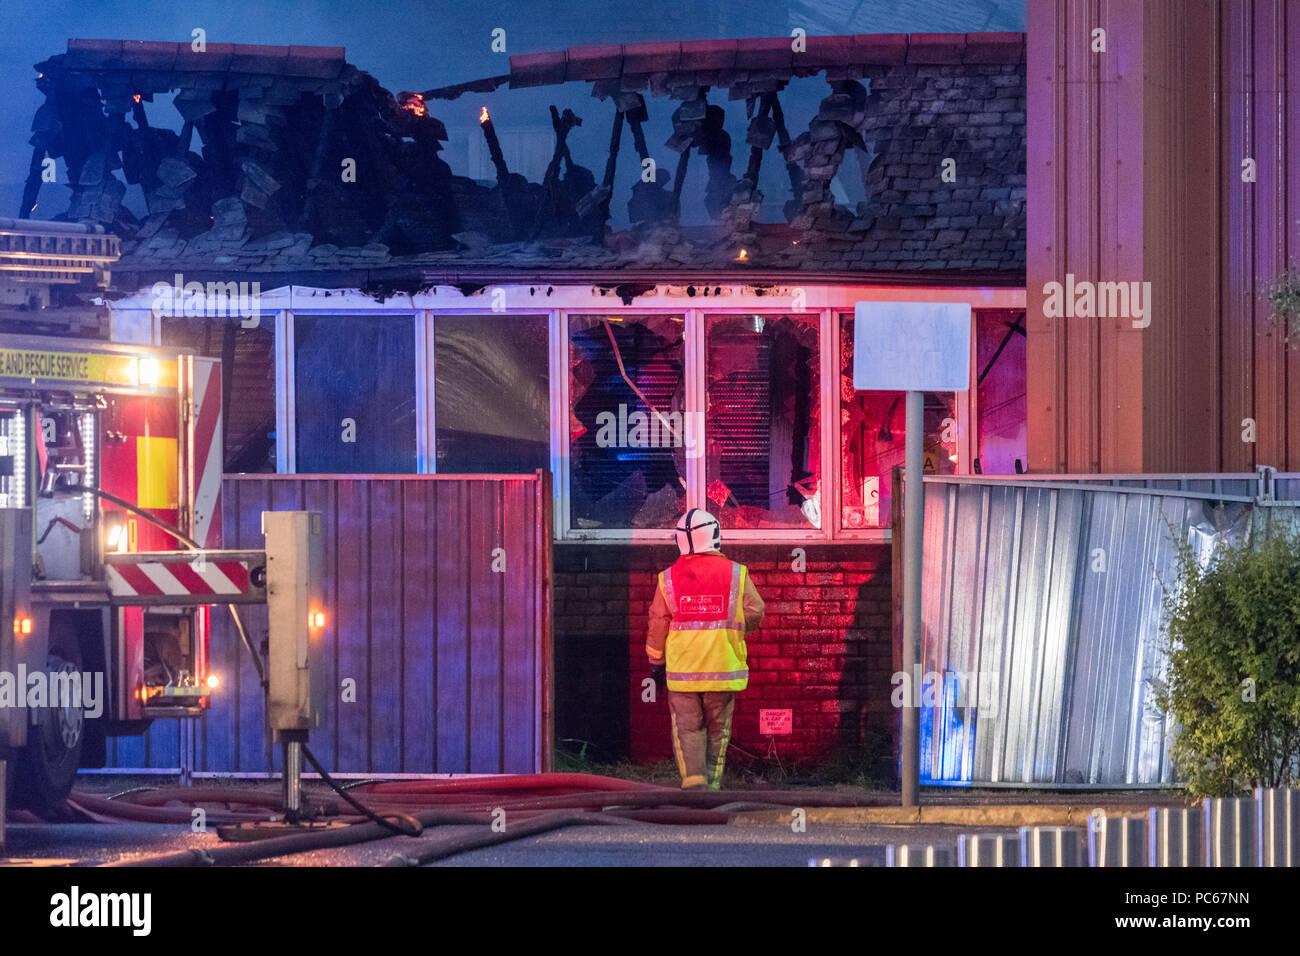 glasgow-scotland-uk-31-july-2018-firefig